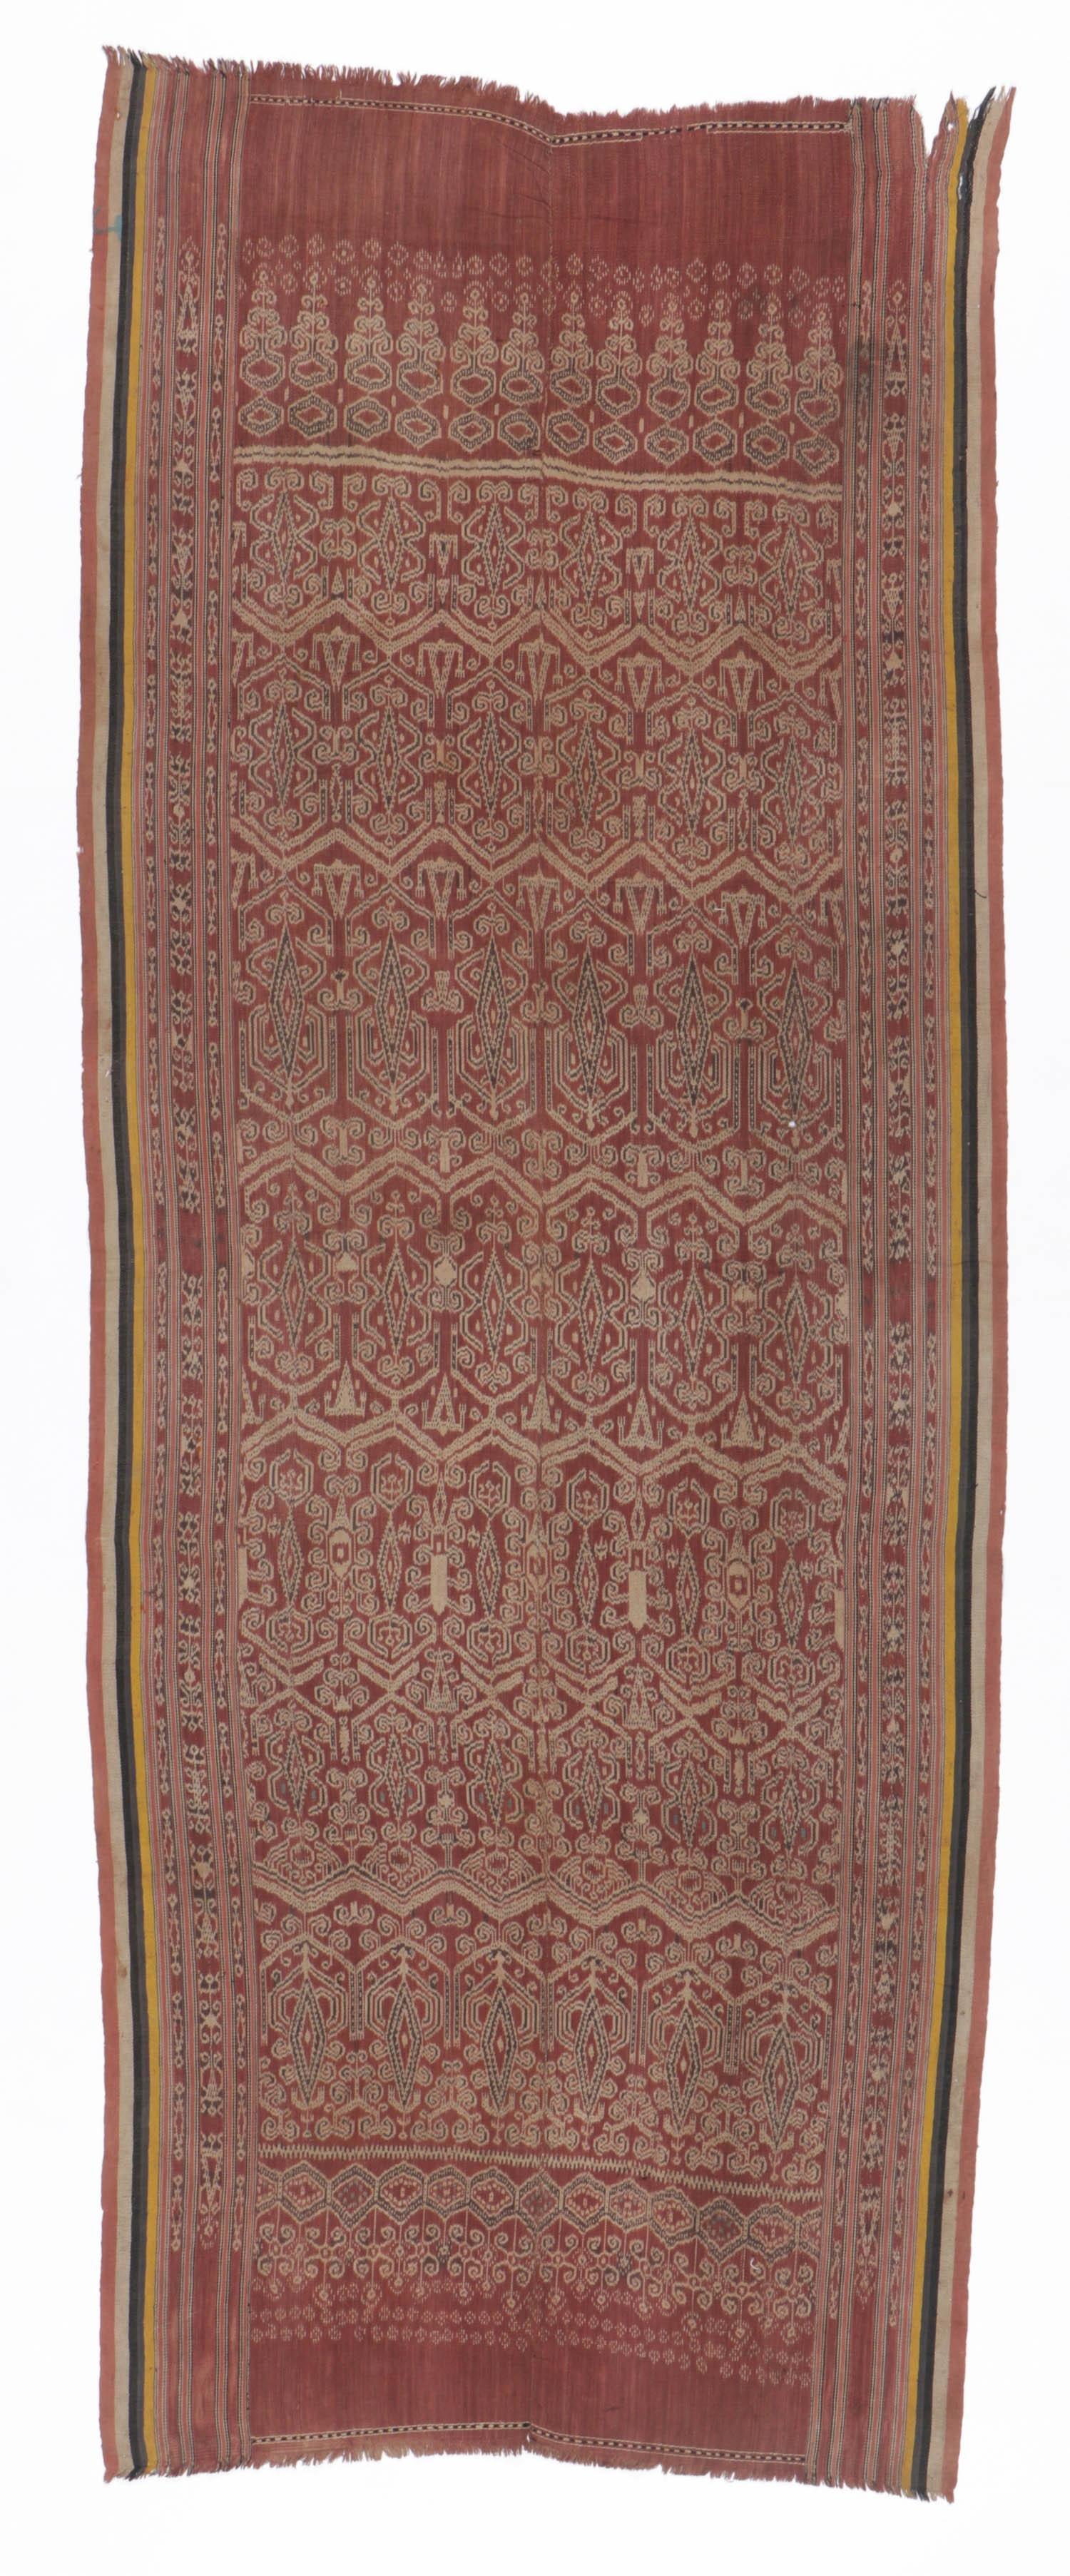 Antique Pua Kombu Ceremonial Ikat Textile